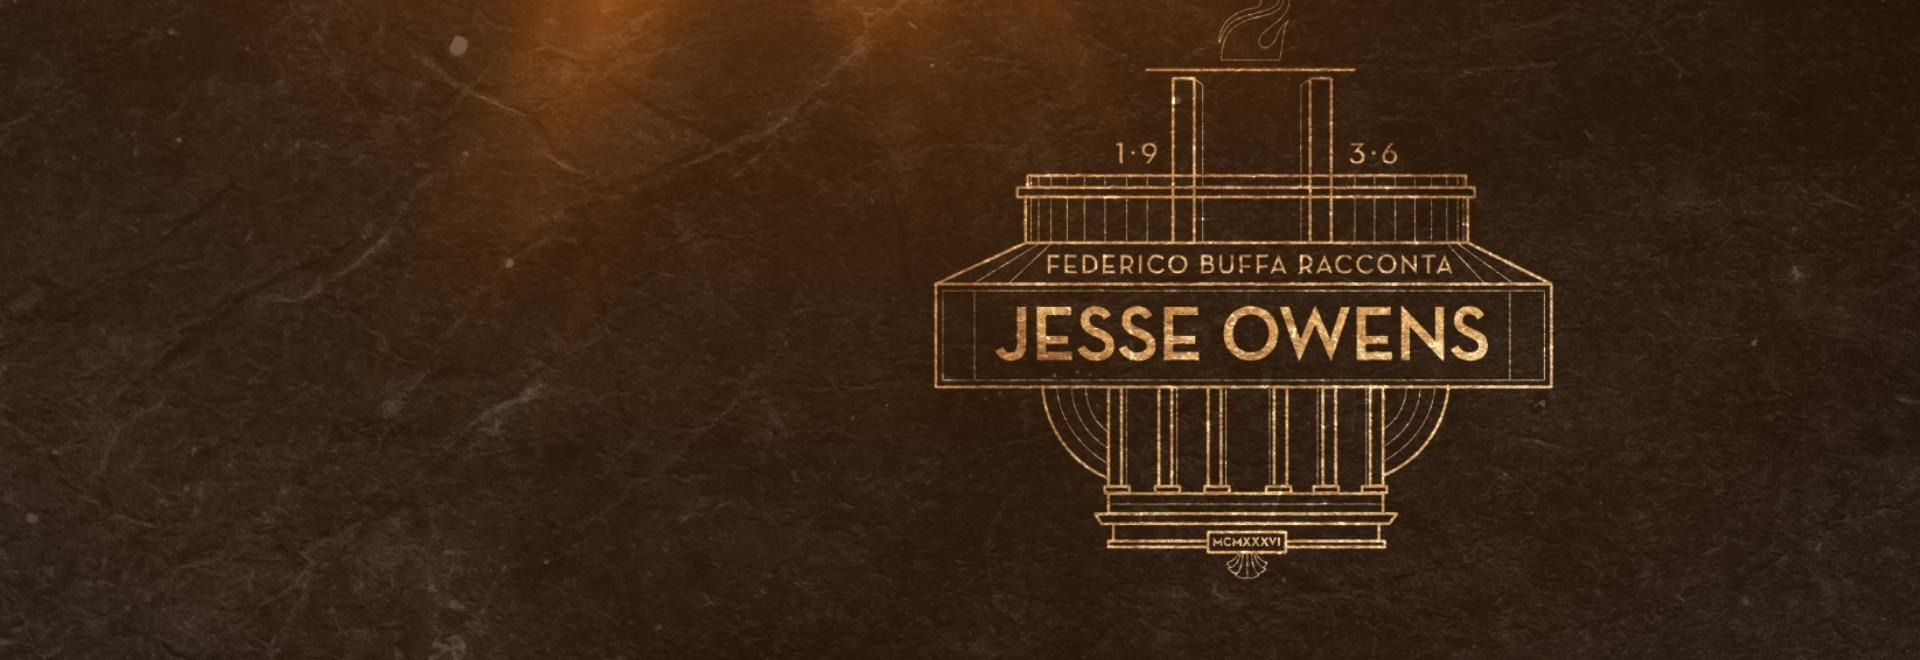 Buffa racconta Jesse Owens